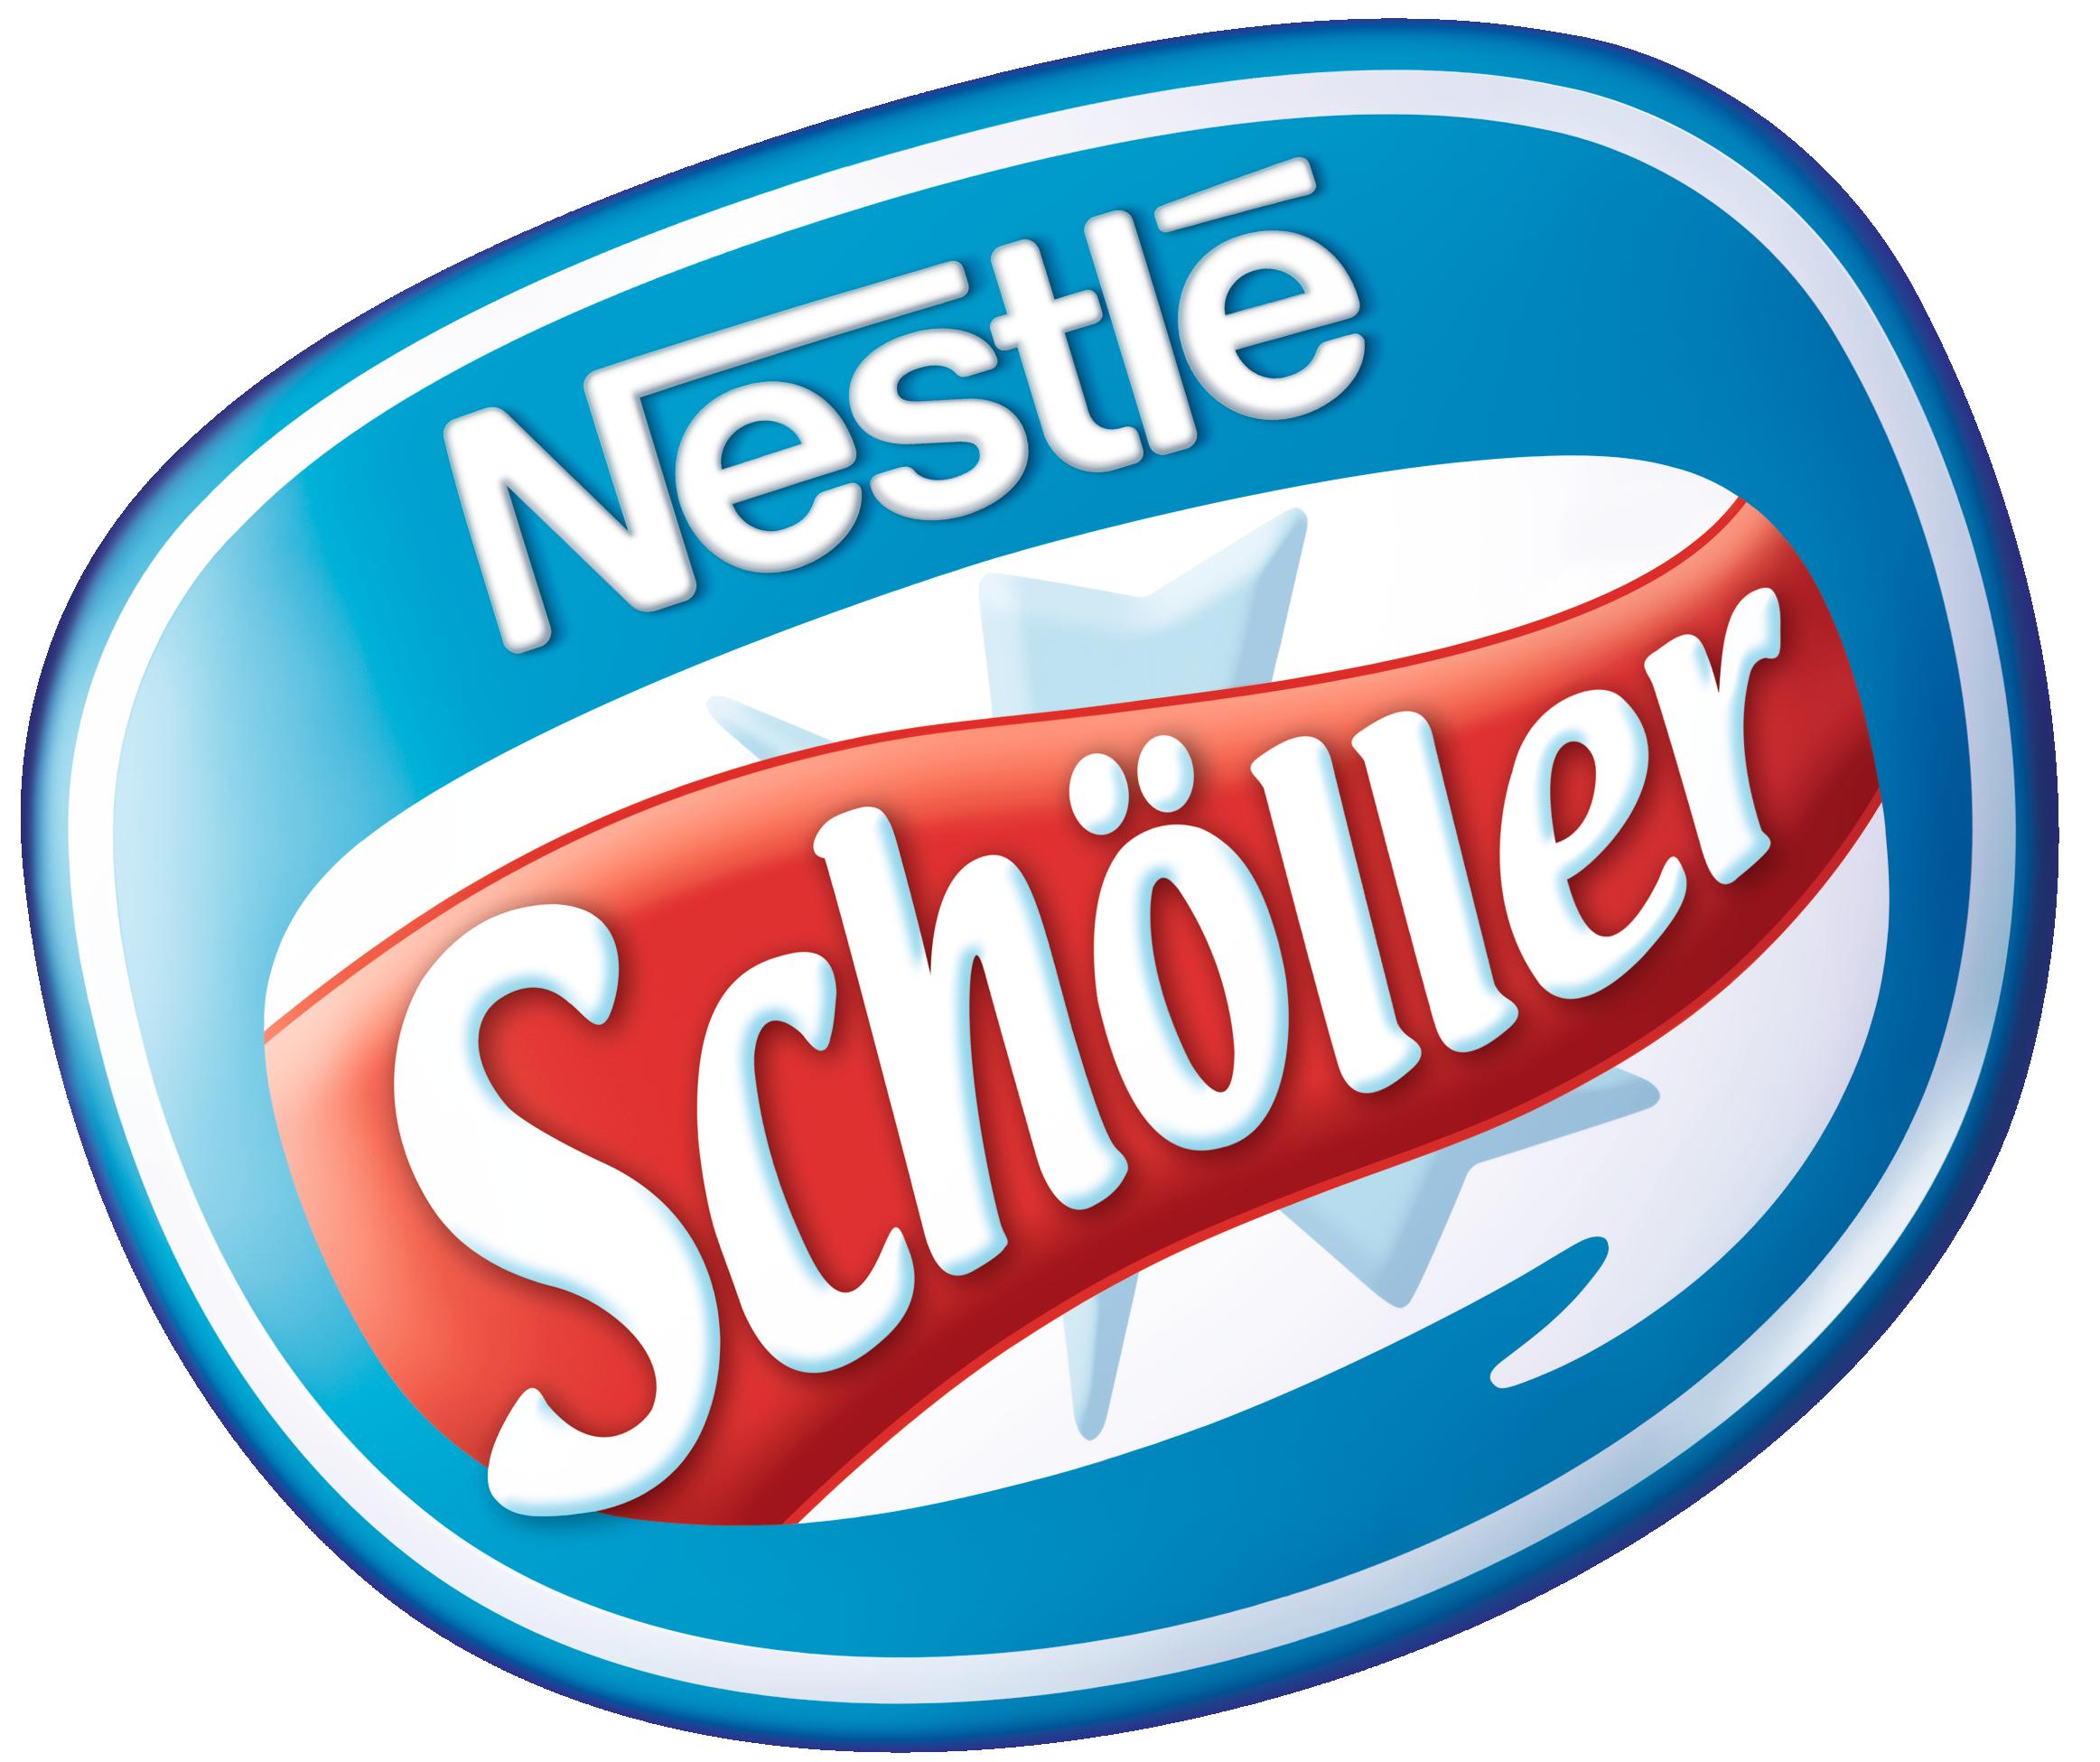 Nestle Scholler 2011